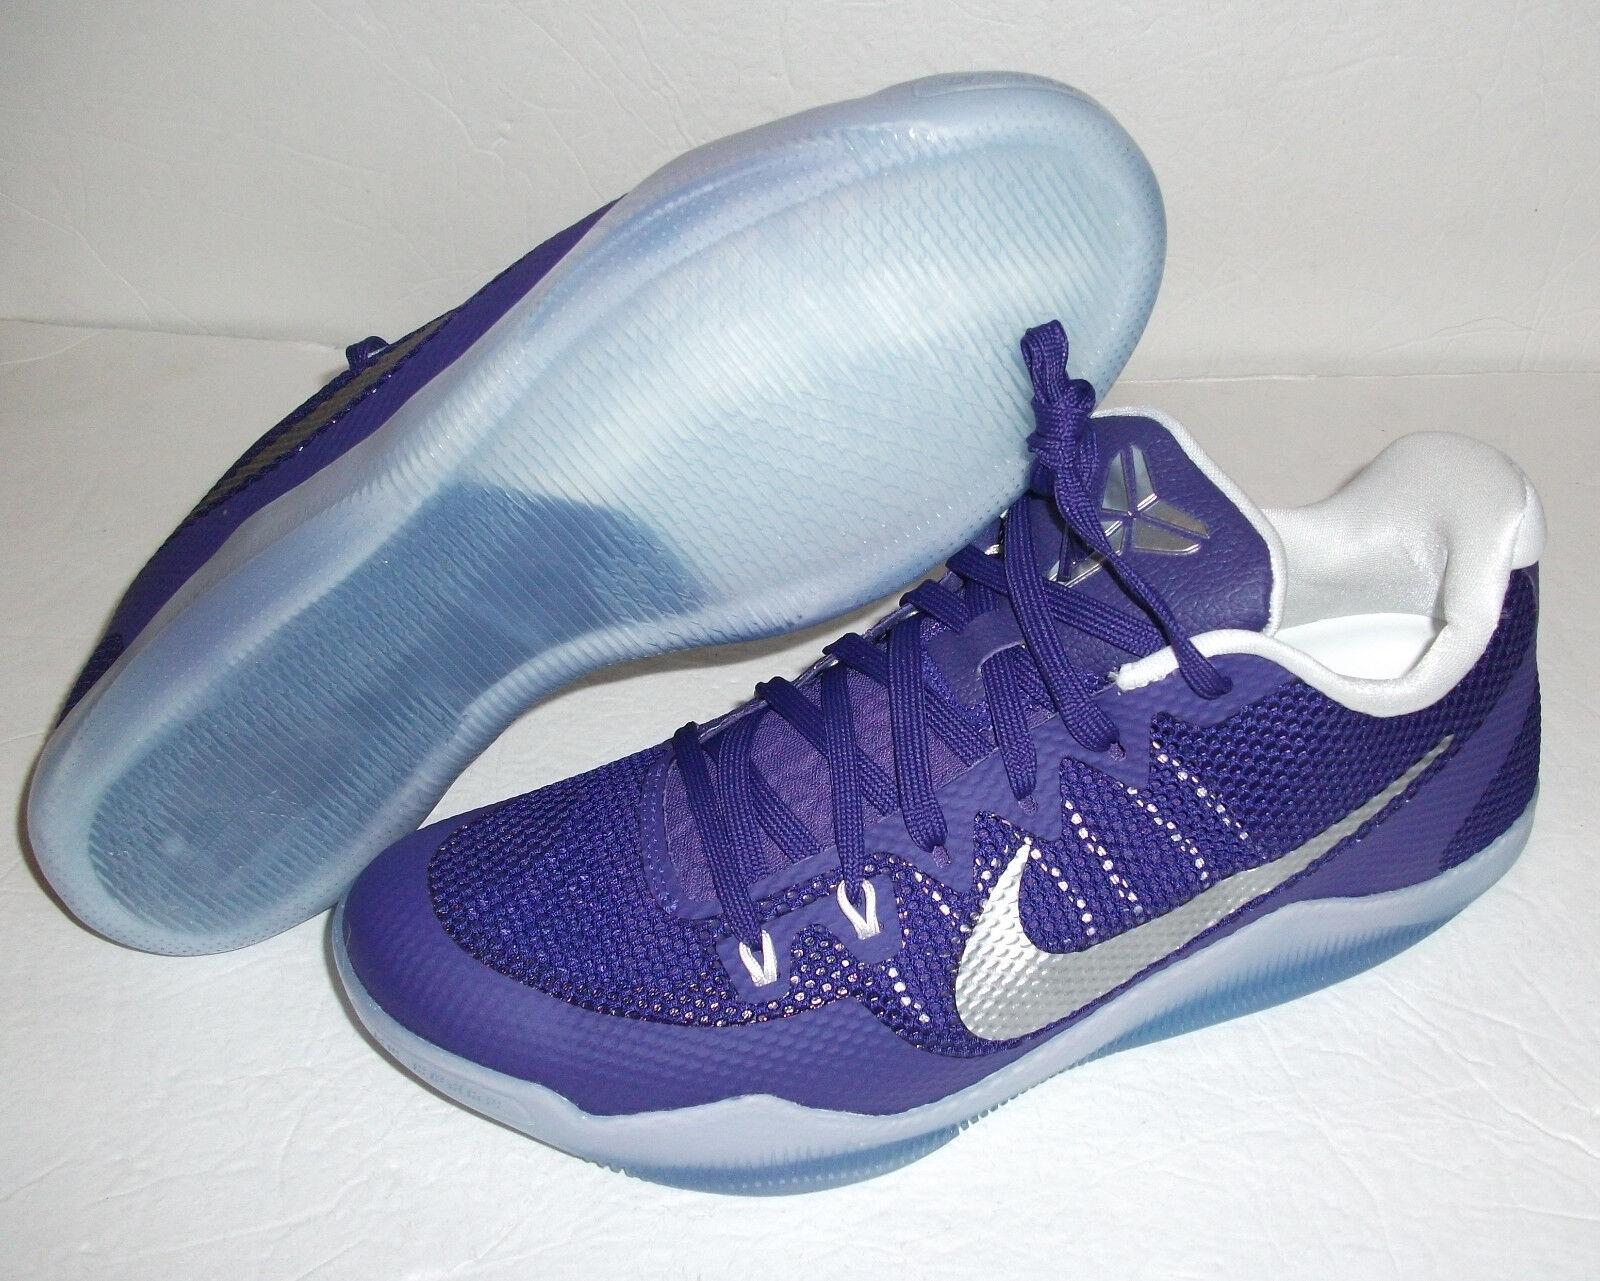 New Nike Kobe XI Promo, Multi Size, Purple/Silver, 856485-551 Sample